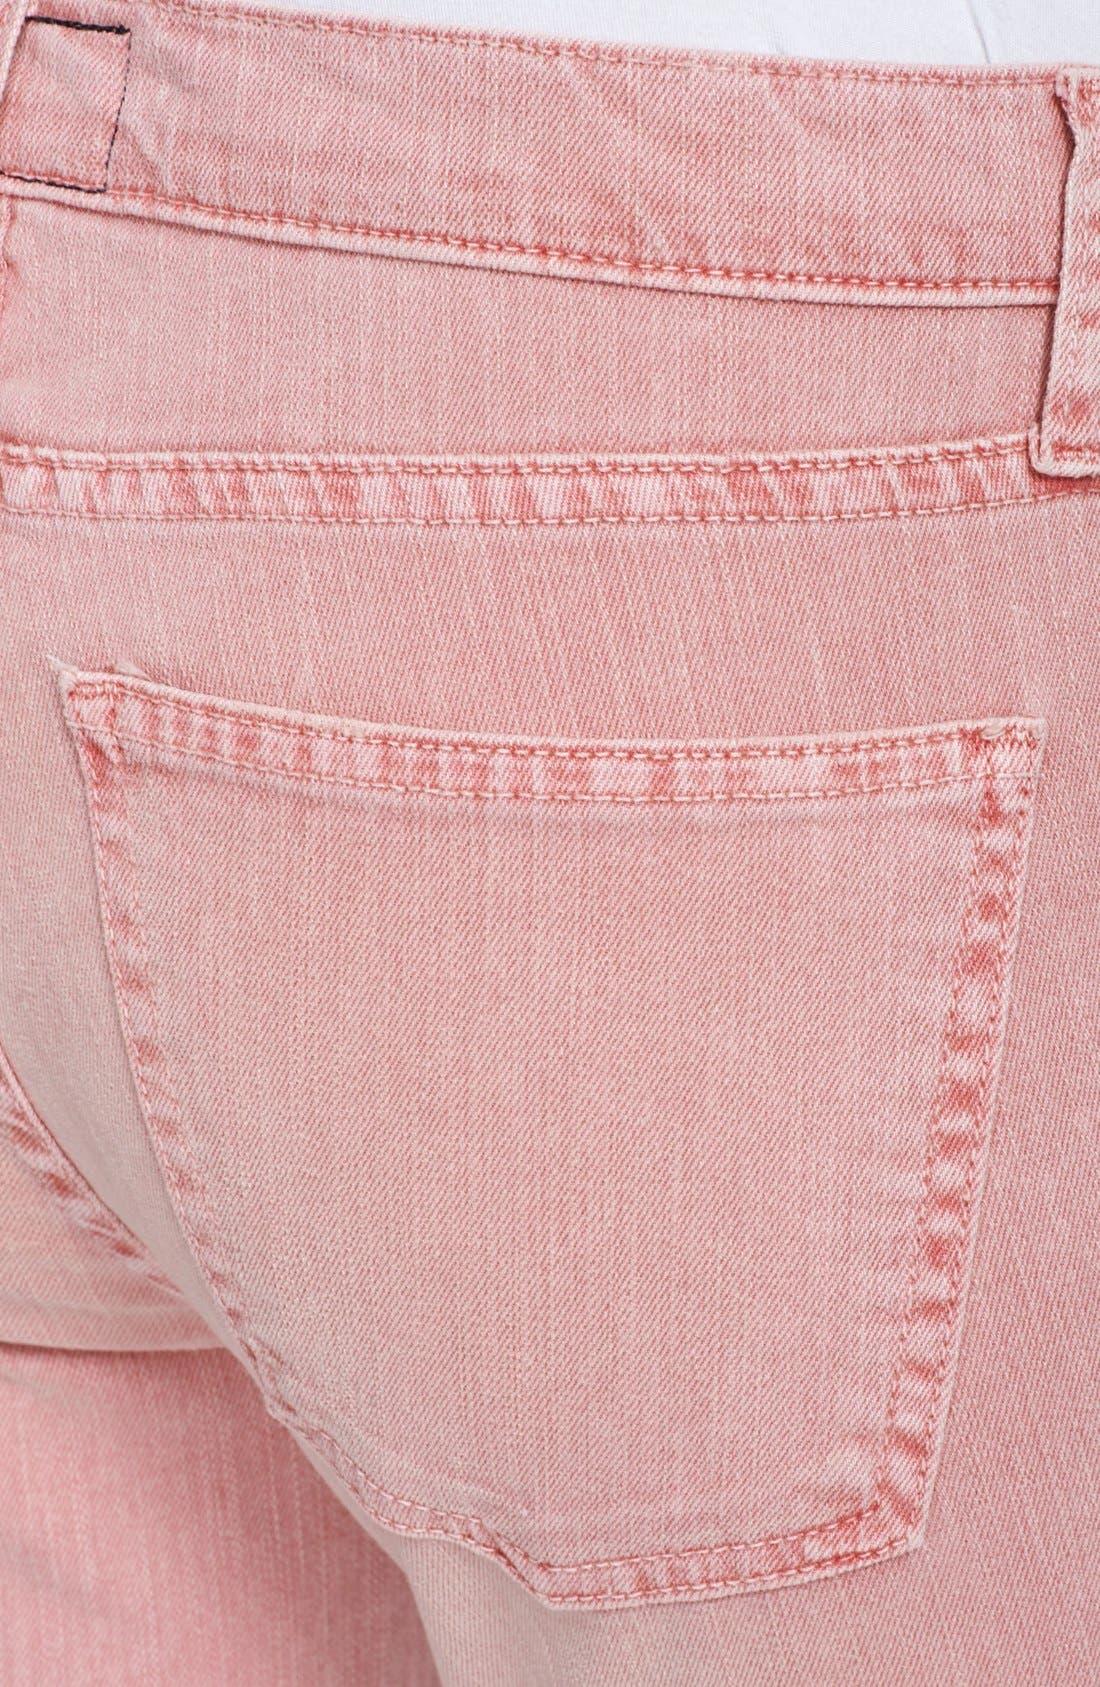 Alternate Image 3  - Current/Elliott 'The Side Slit Stiletto' Jeans